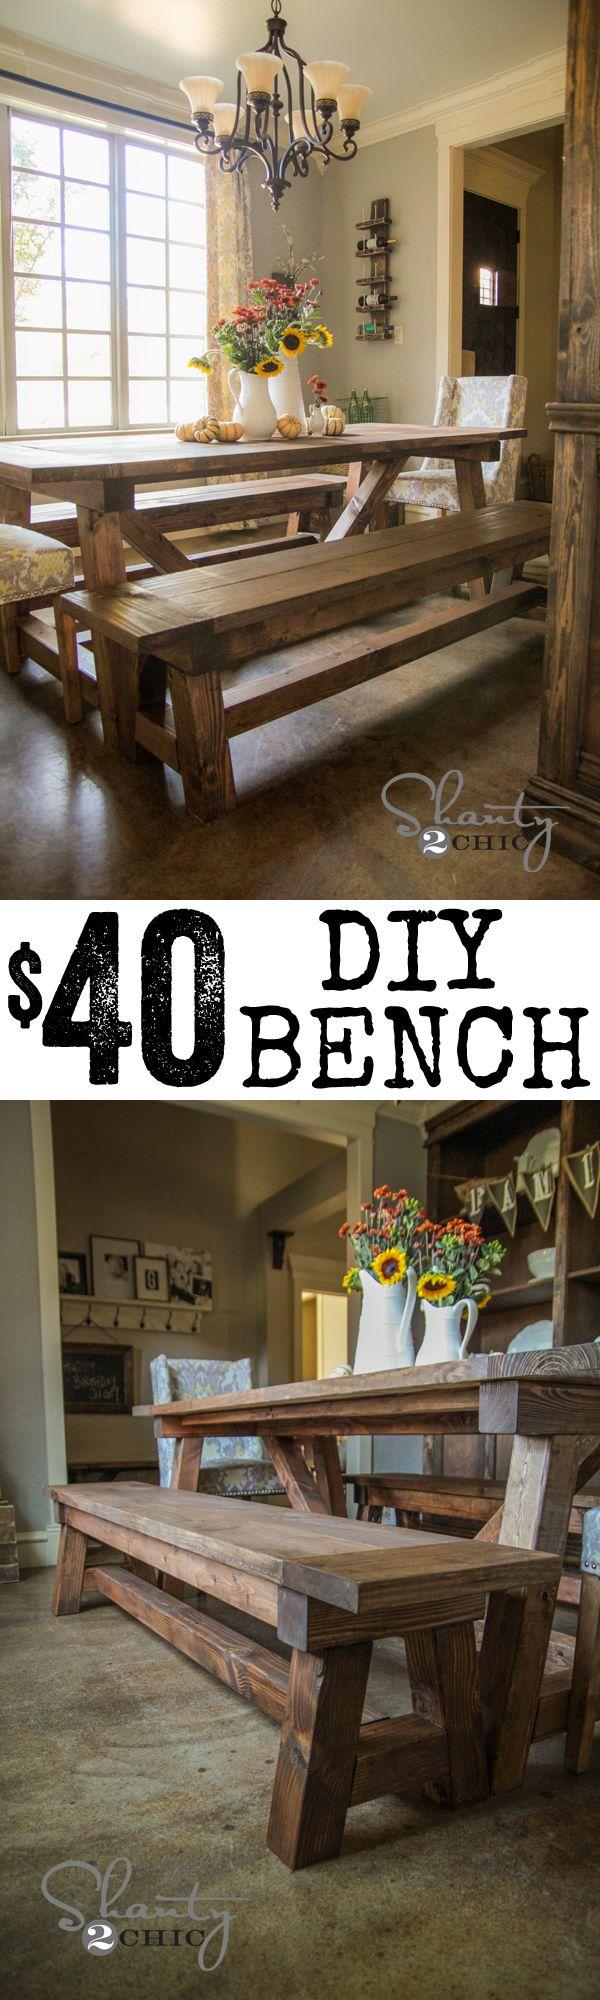 $40 DIY Bench Project Plan - @ShanTil  | Crafts/home decor